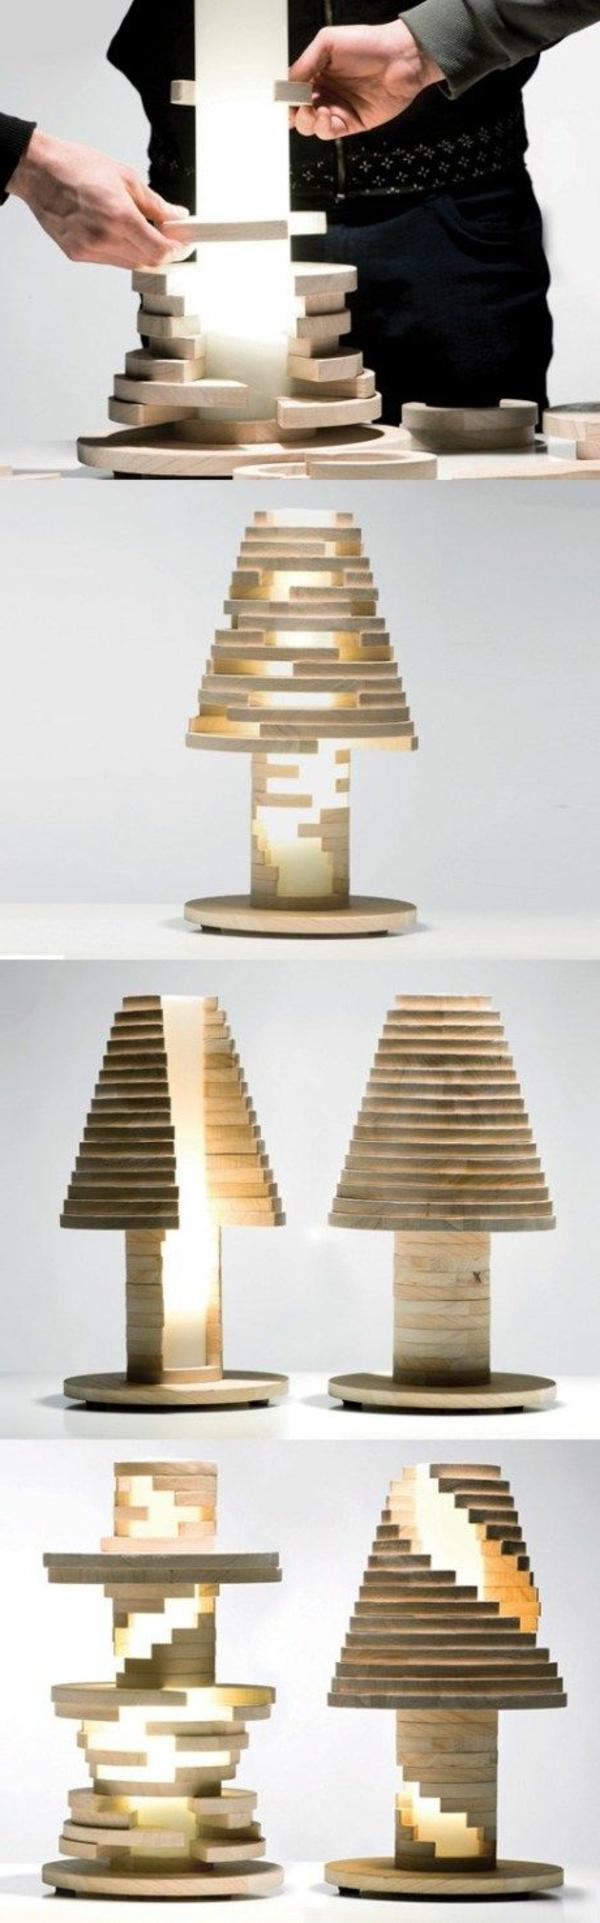 lampe-en-bois-ornement